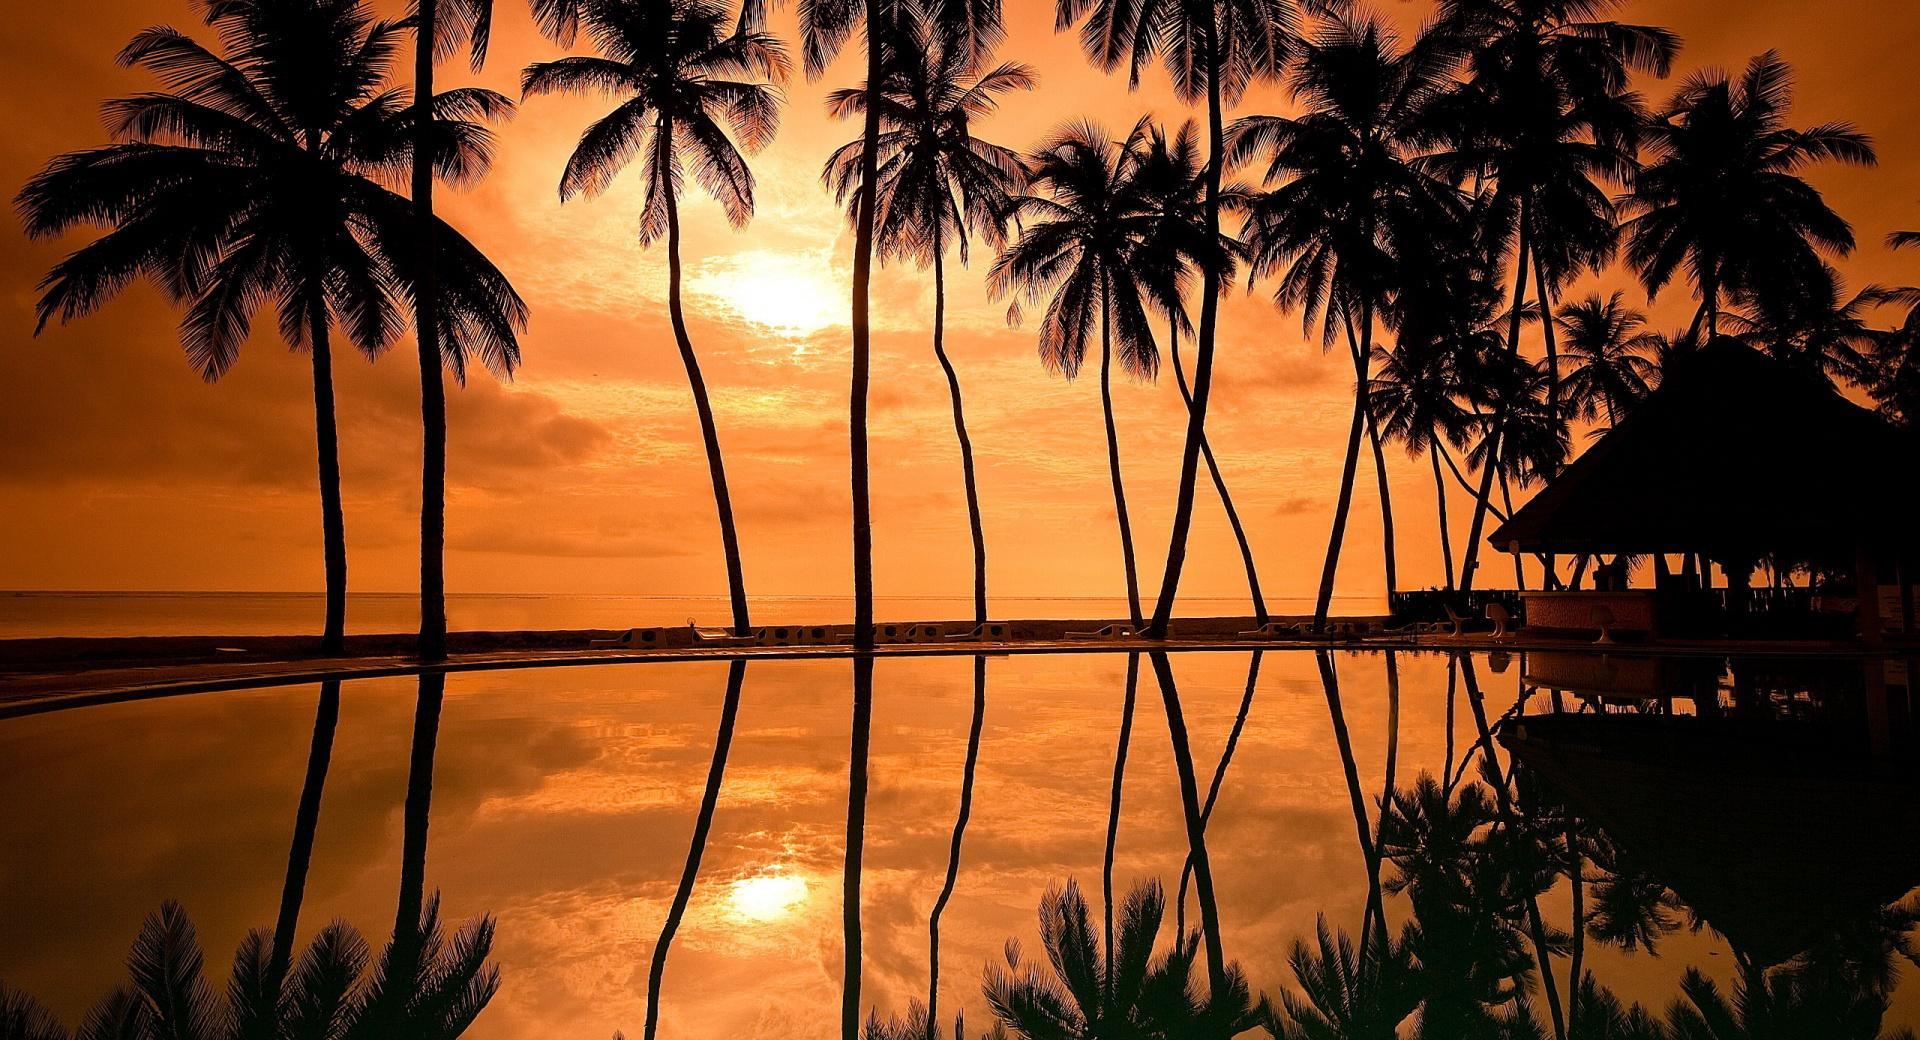 Hawaiian Beach Sunset Reflection wallpapers HD quality